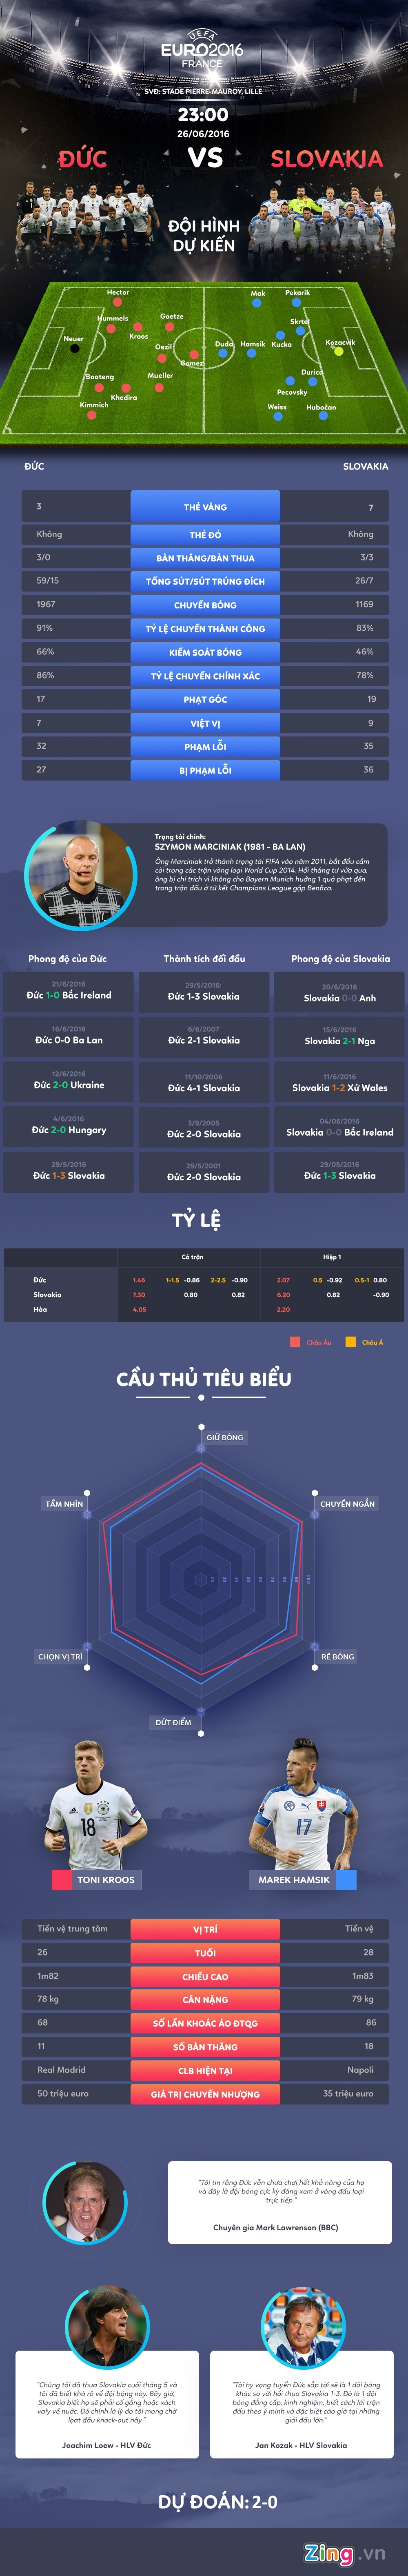 Duc vs Slovakia: Thoi khac cua su that hinh anh 1